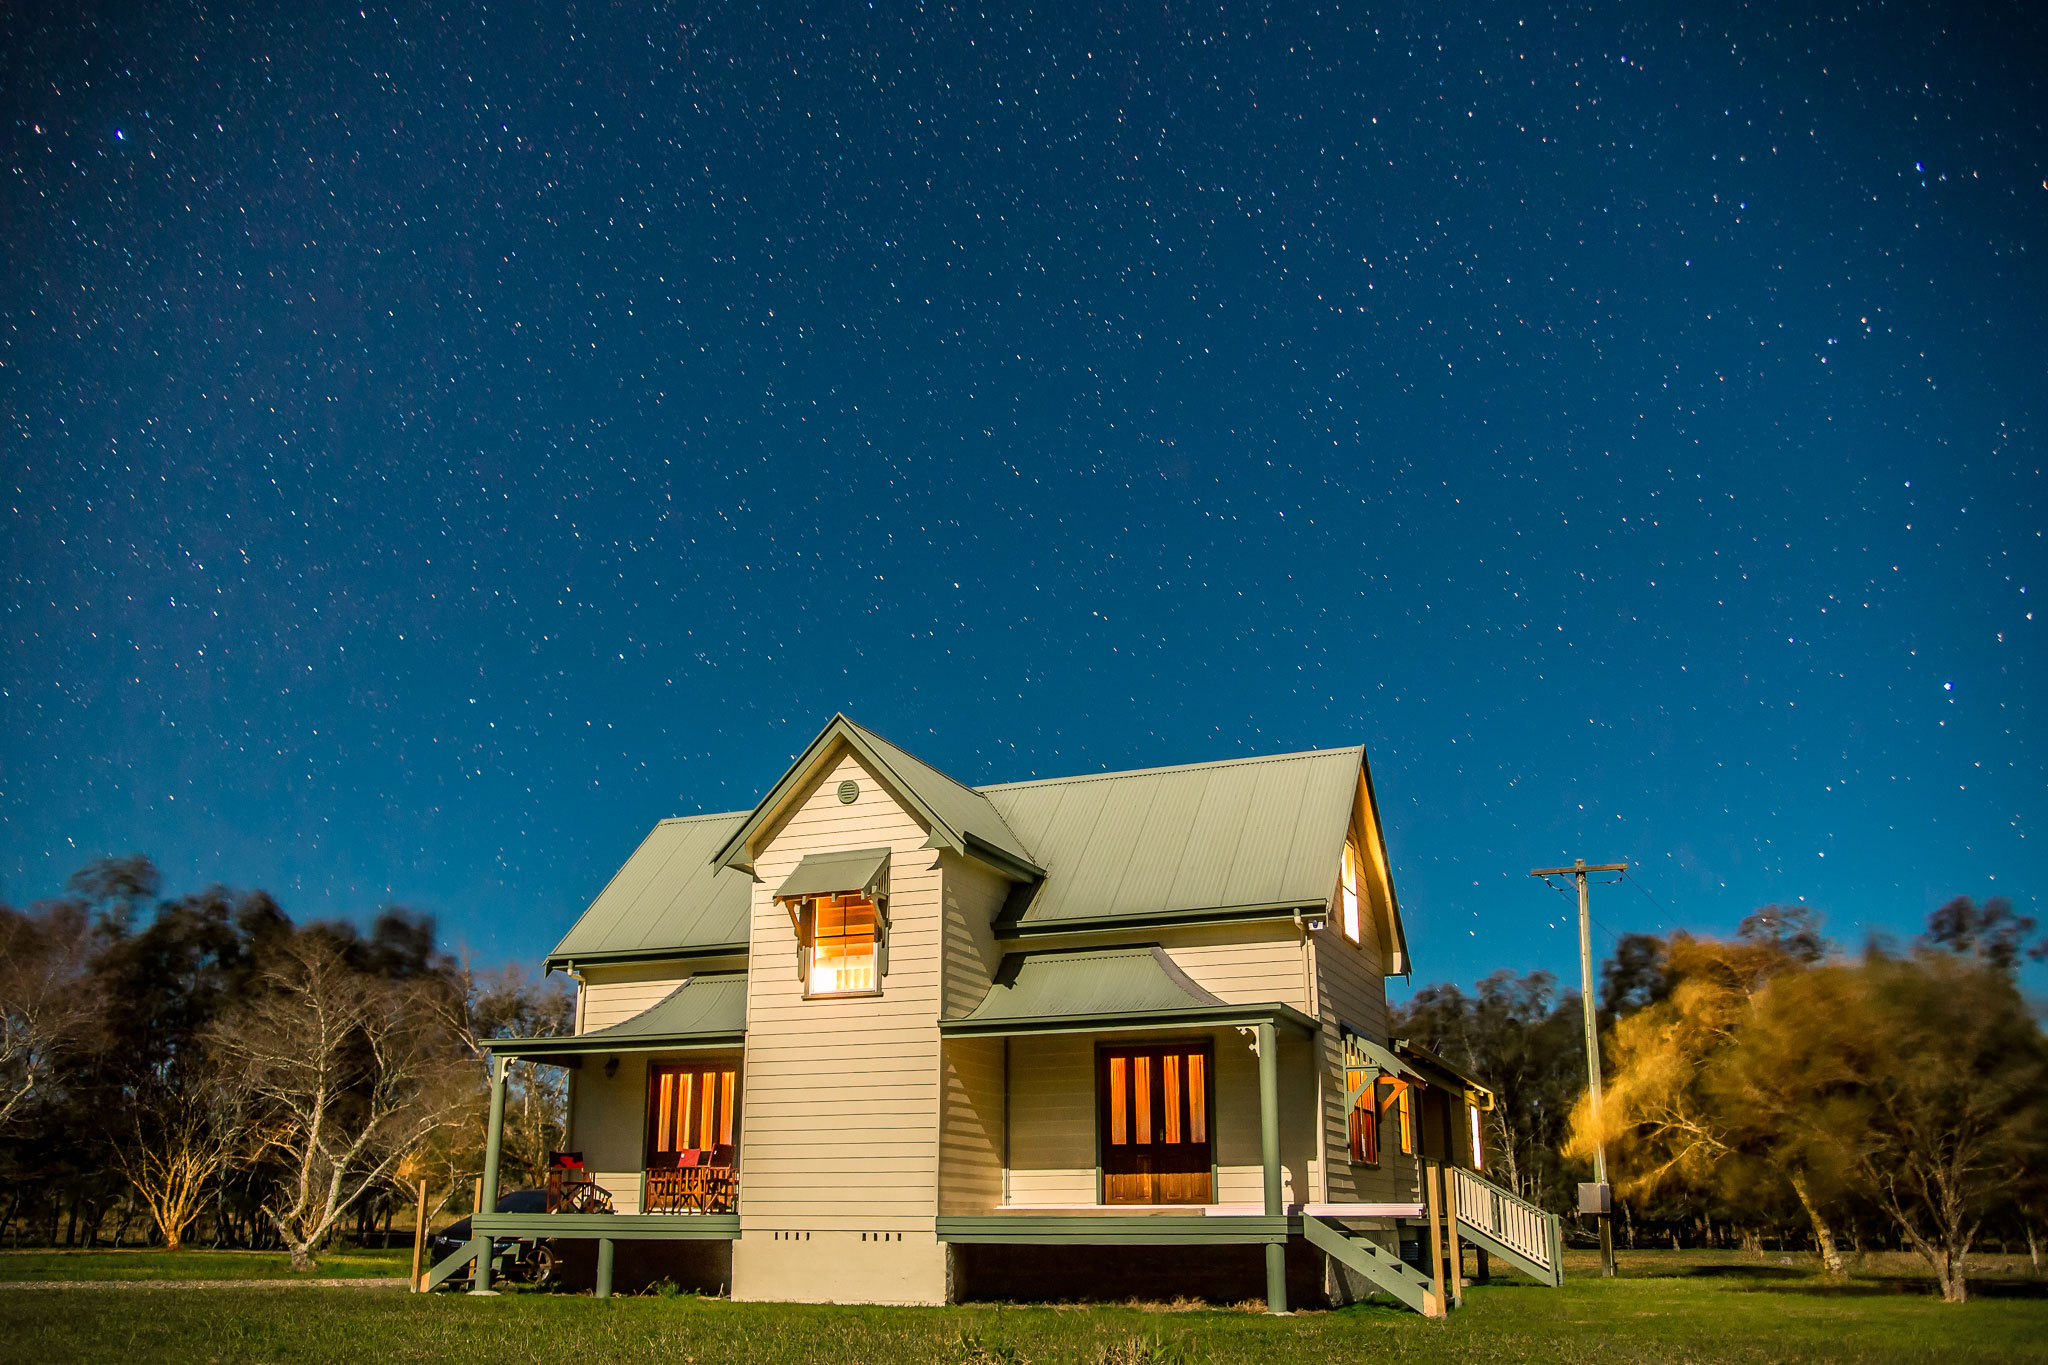 Shinglers-Cottage-31.jpg